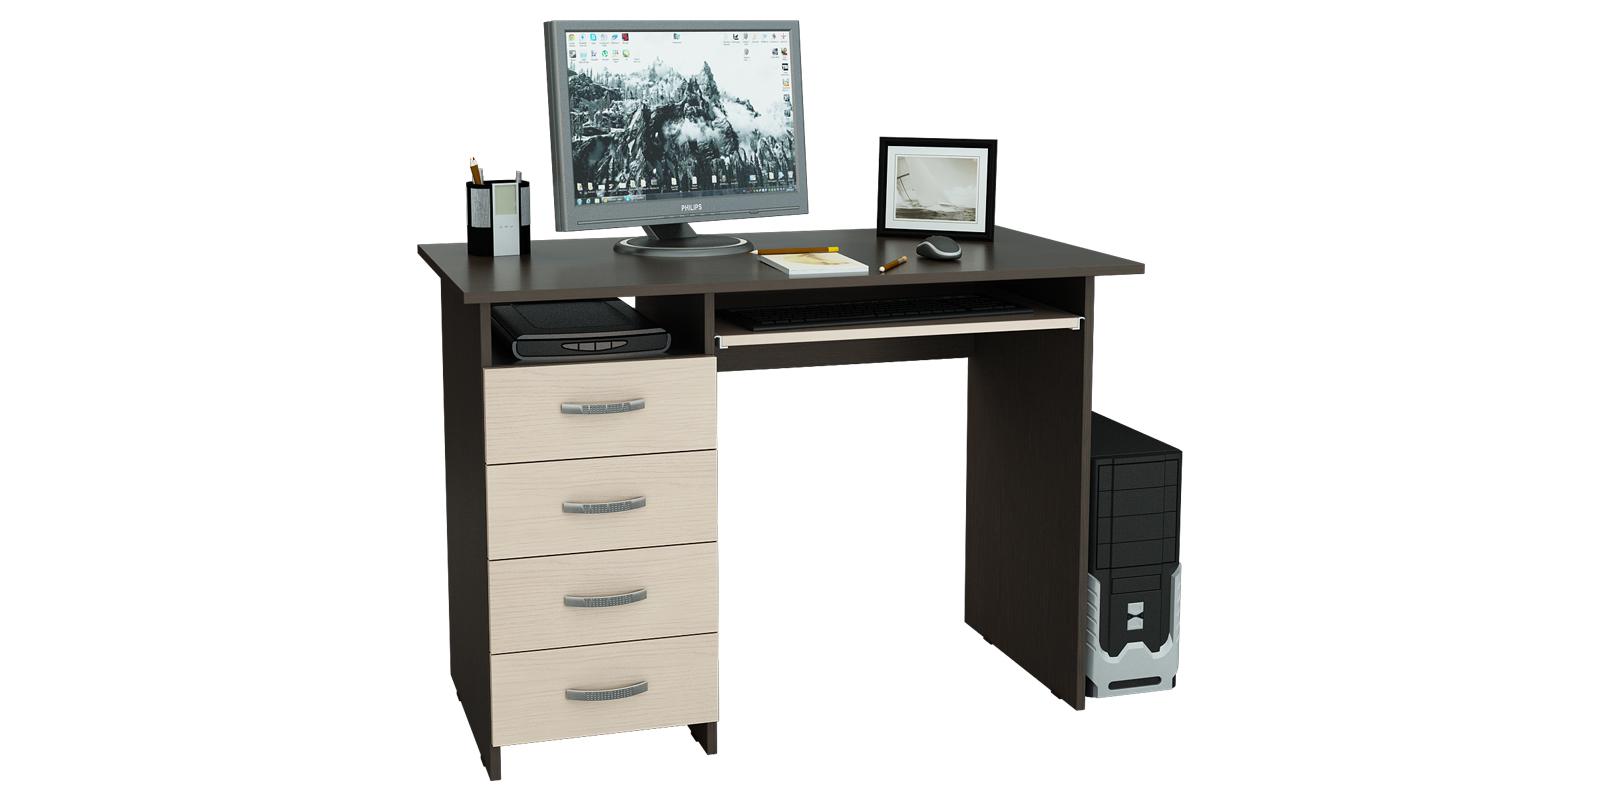 Стол компьютерный Харви (венге/дуб молочный)